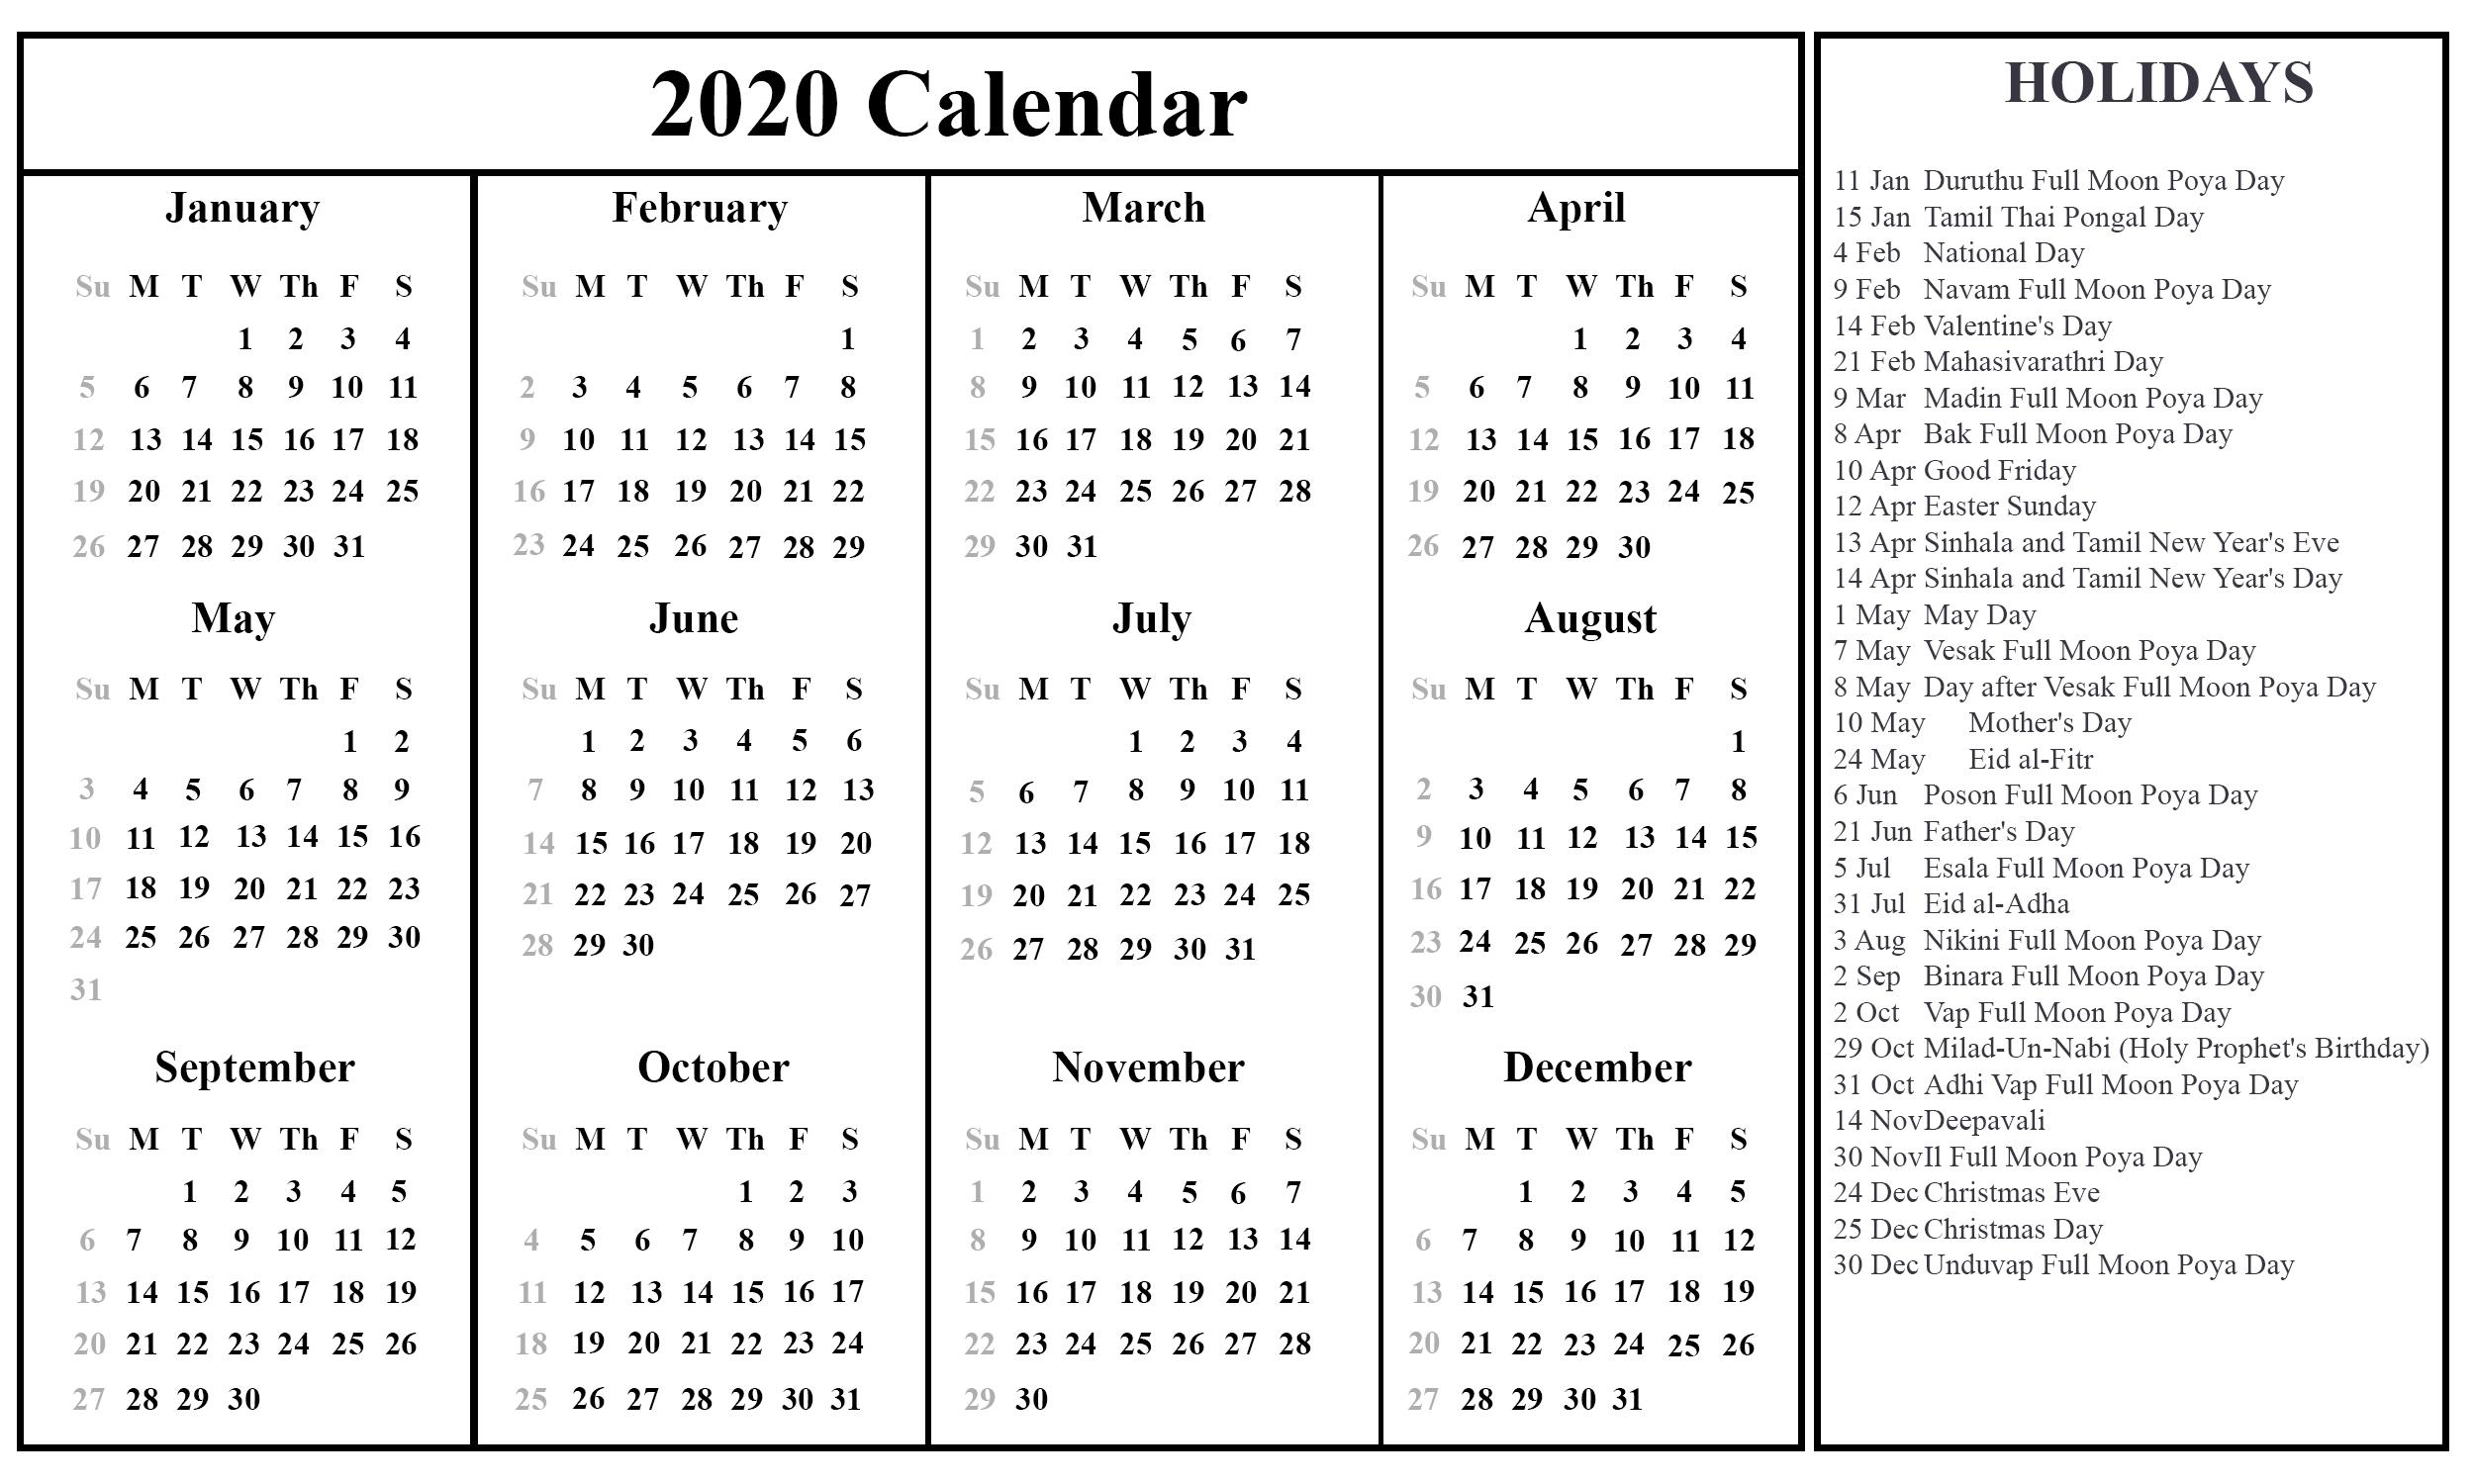 Free Sri Lanka 2020 Calendar With Holidays In Pdf Word-2021 Holidays Mercantile Sl